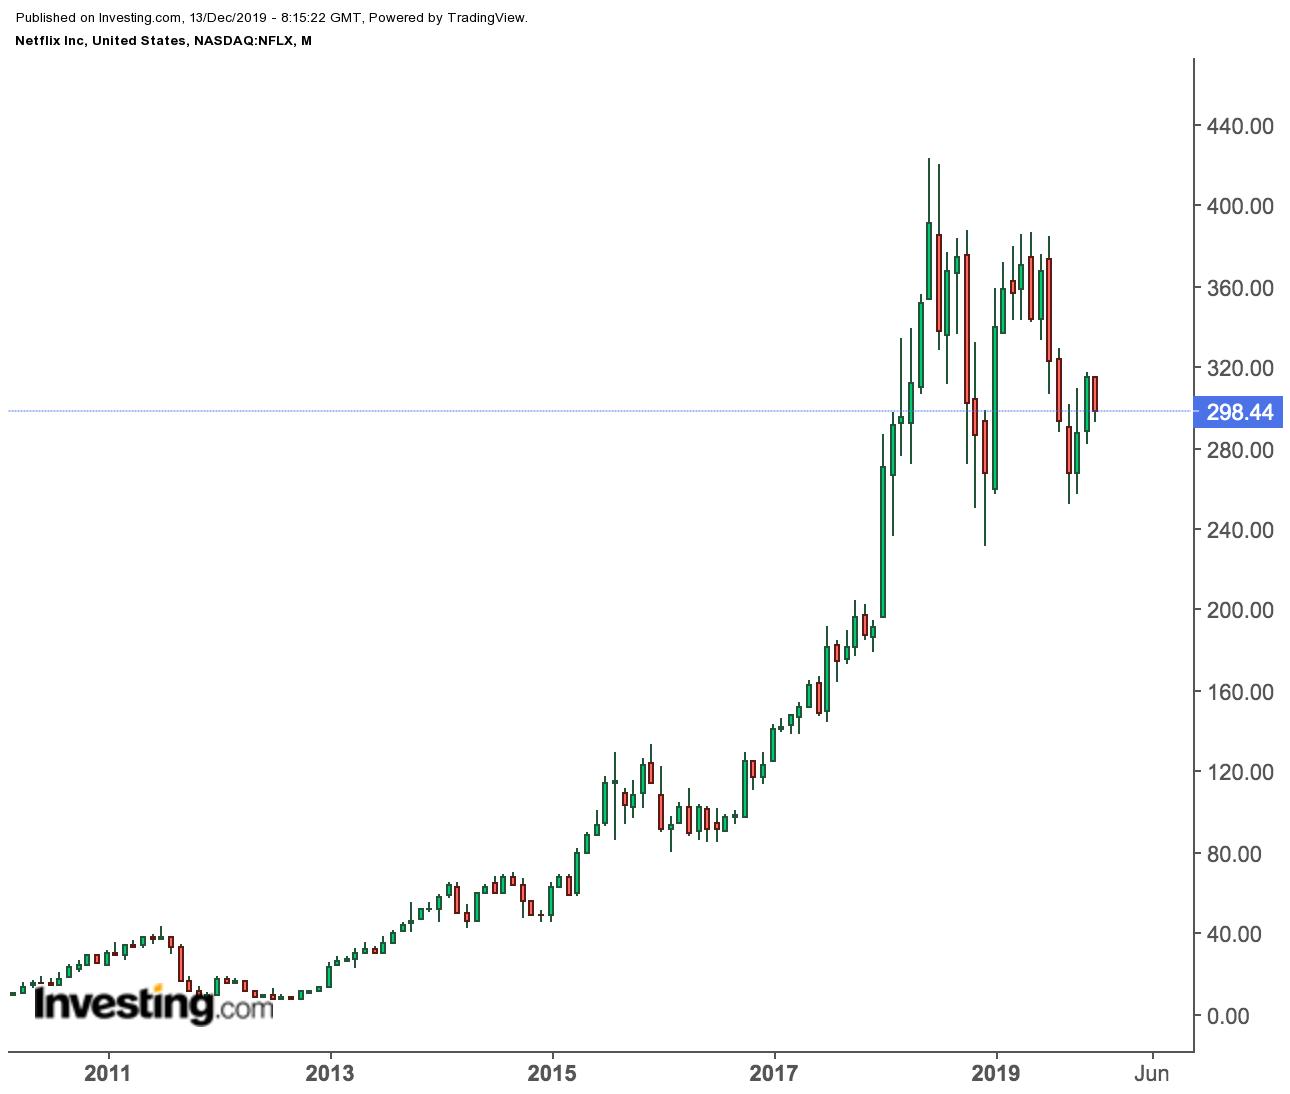 Netflix Monthly Price Chart